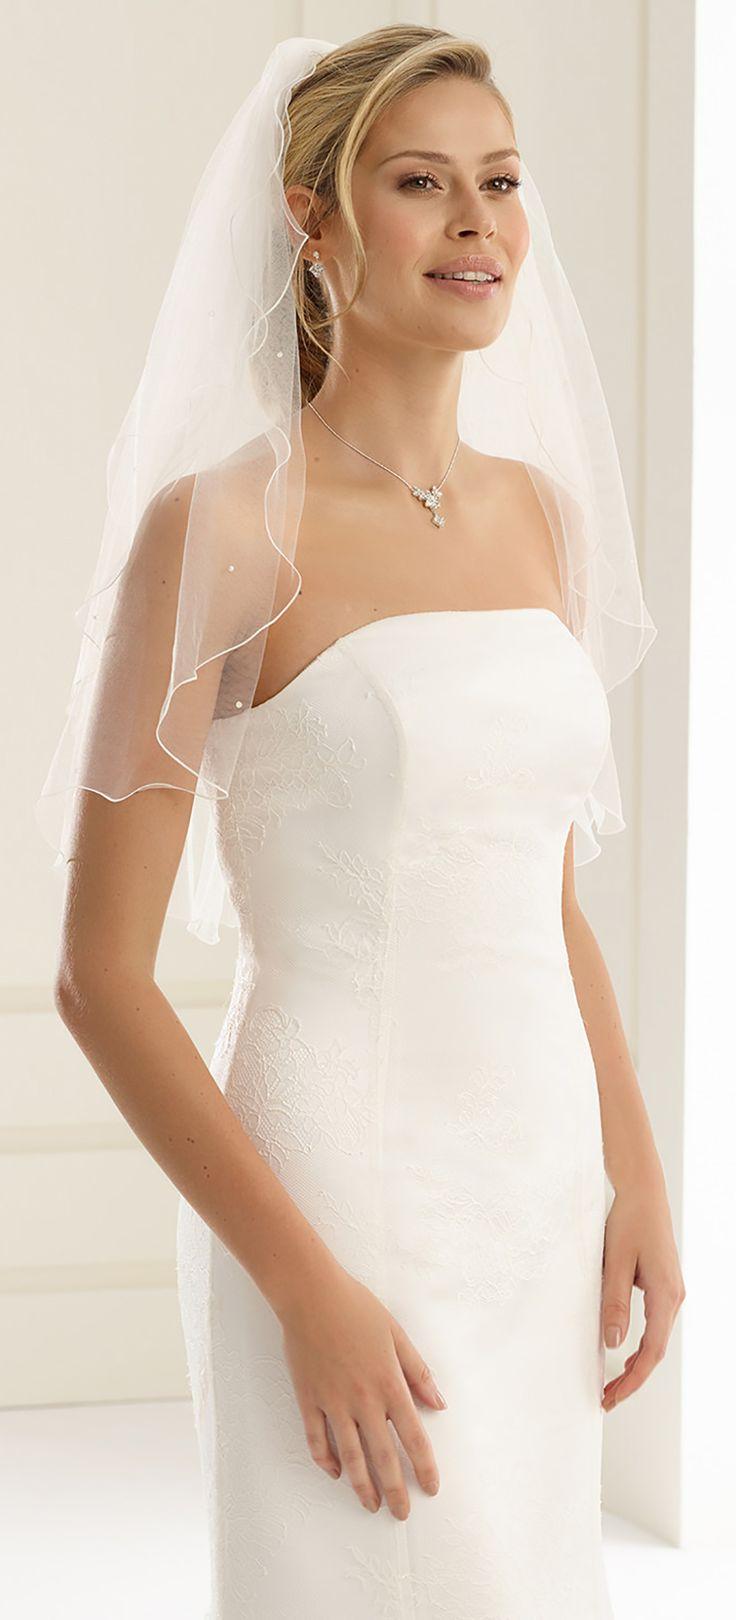 Astonishing veil S22P from Bianco Evento #biancoevento #veil #weddingdress #weddingideas #bridetobe